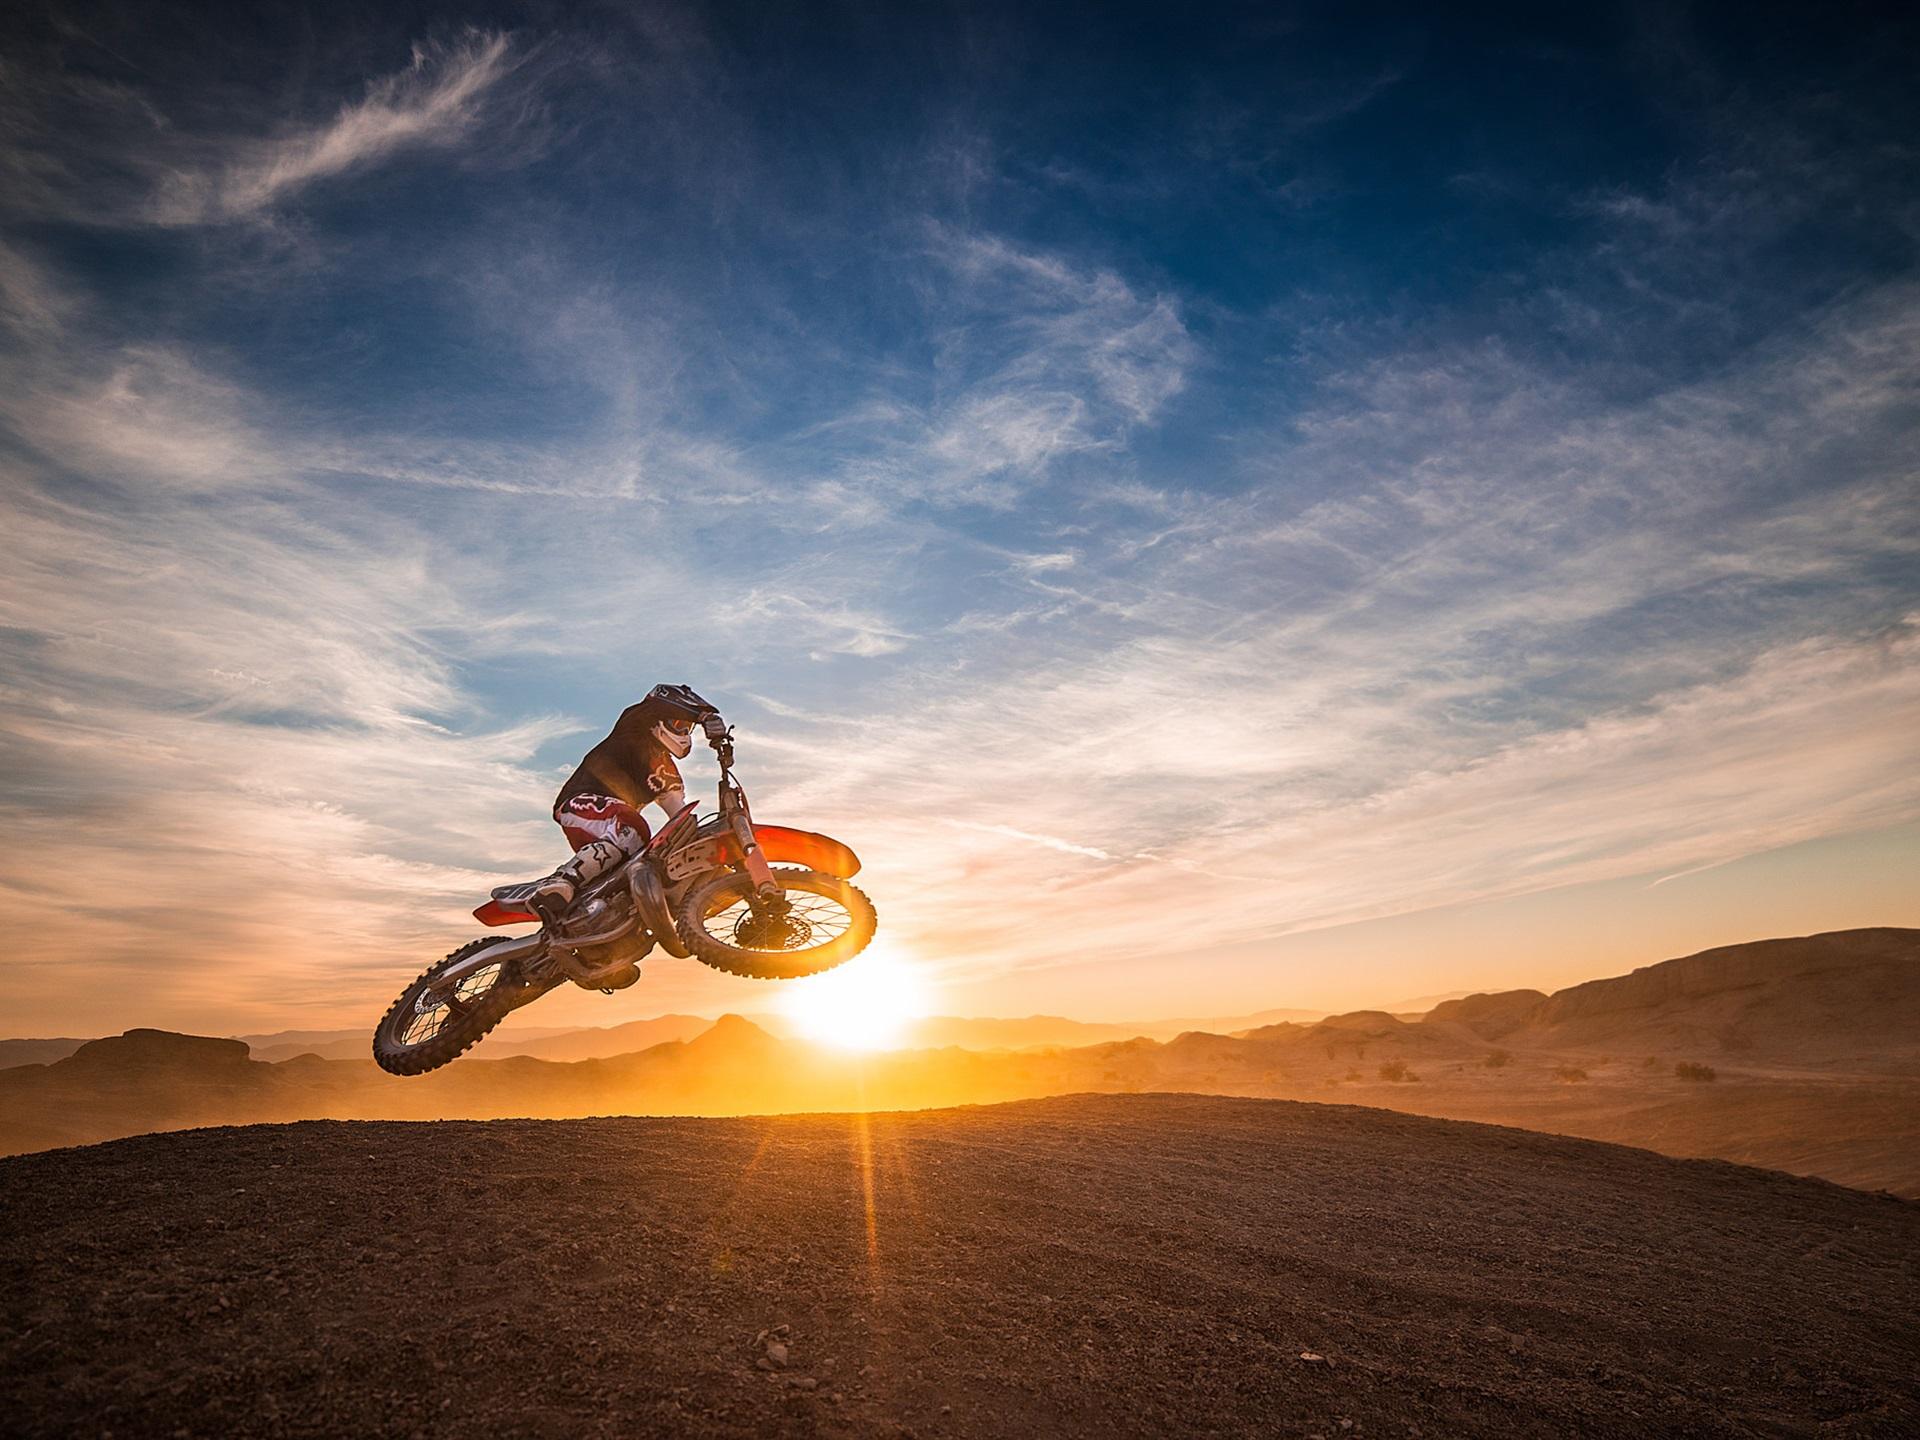 Wallpaper Motorcycle race sports jump sunset 1920x1440 HD 1920x1440